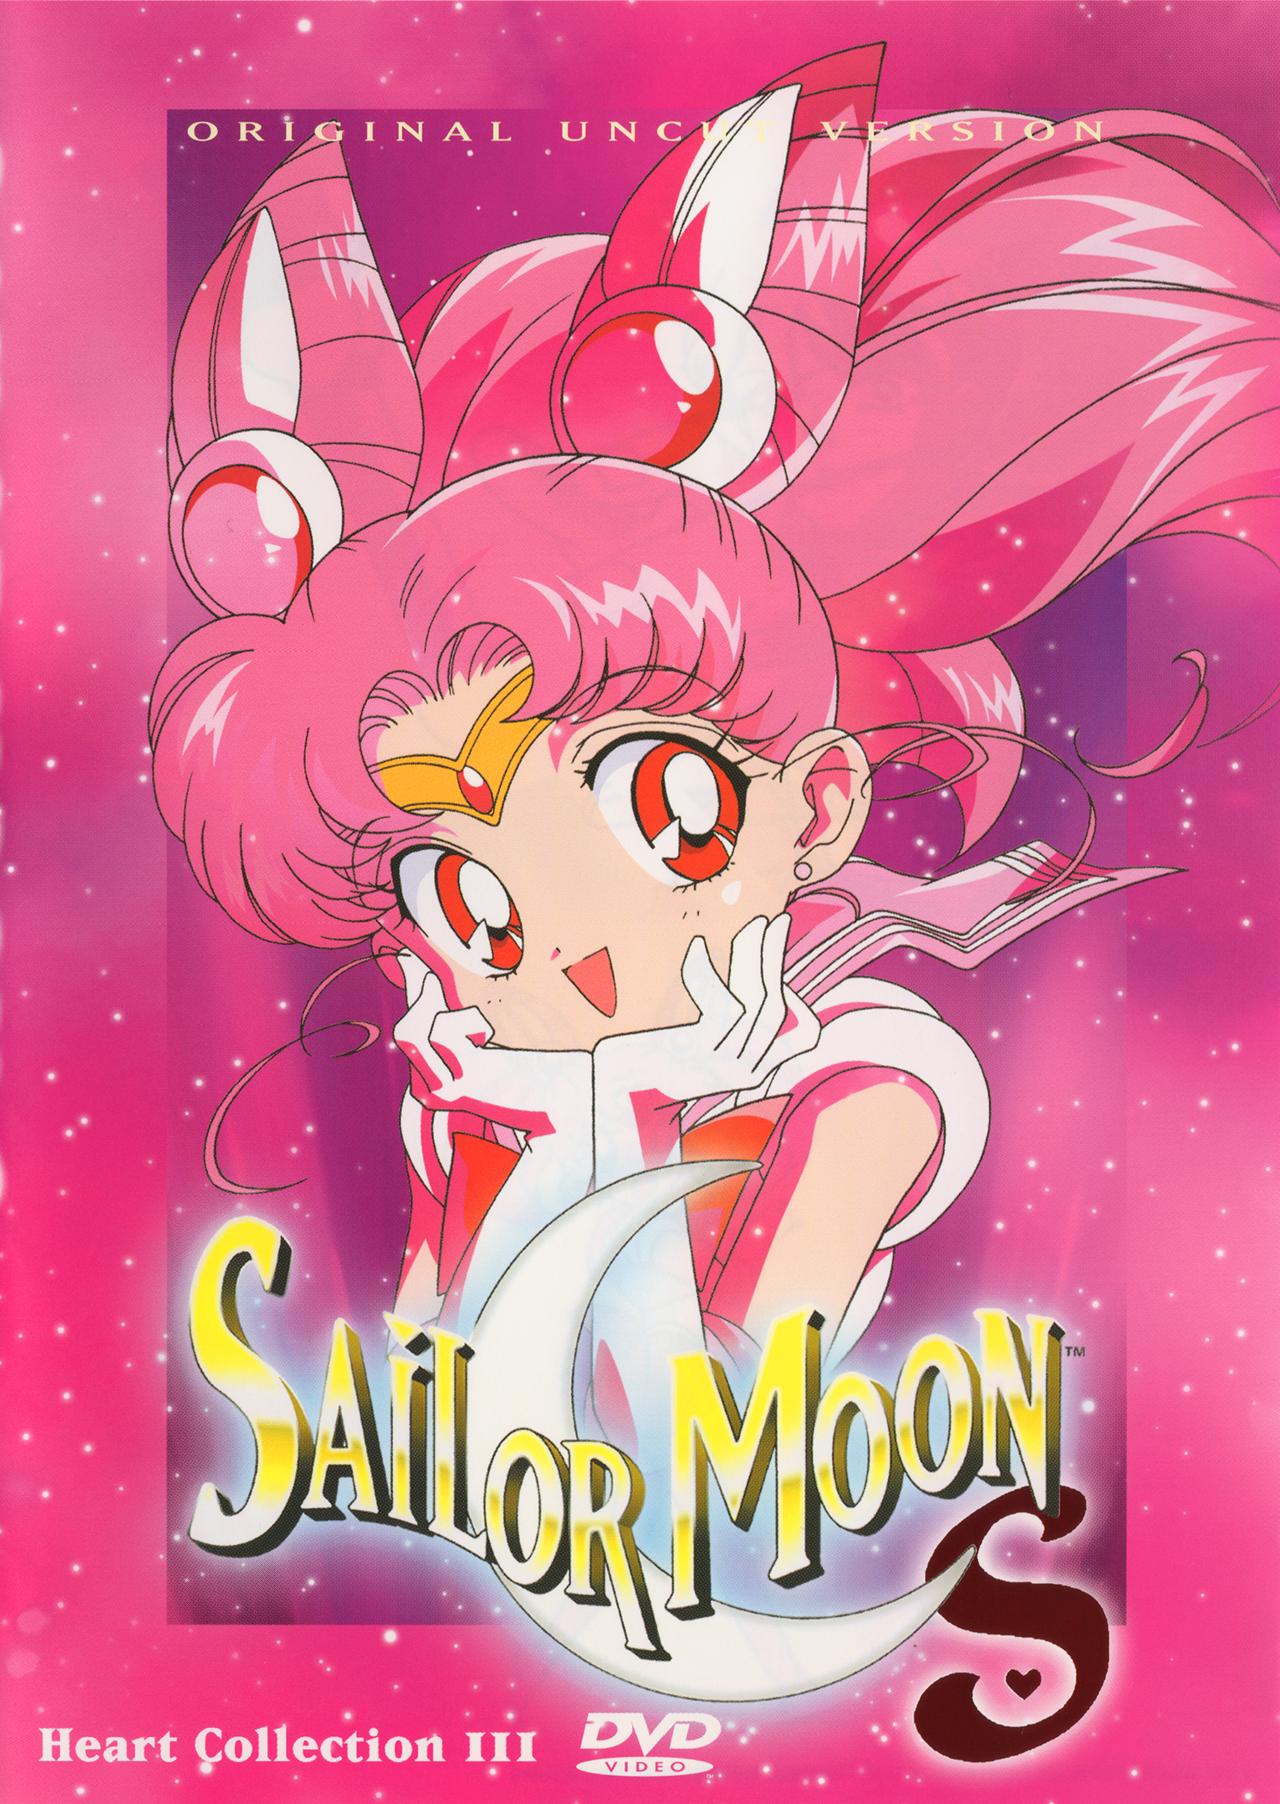 Sailor Moon S - Heart Collection III